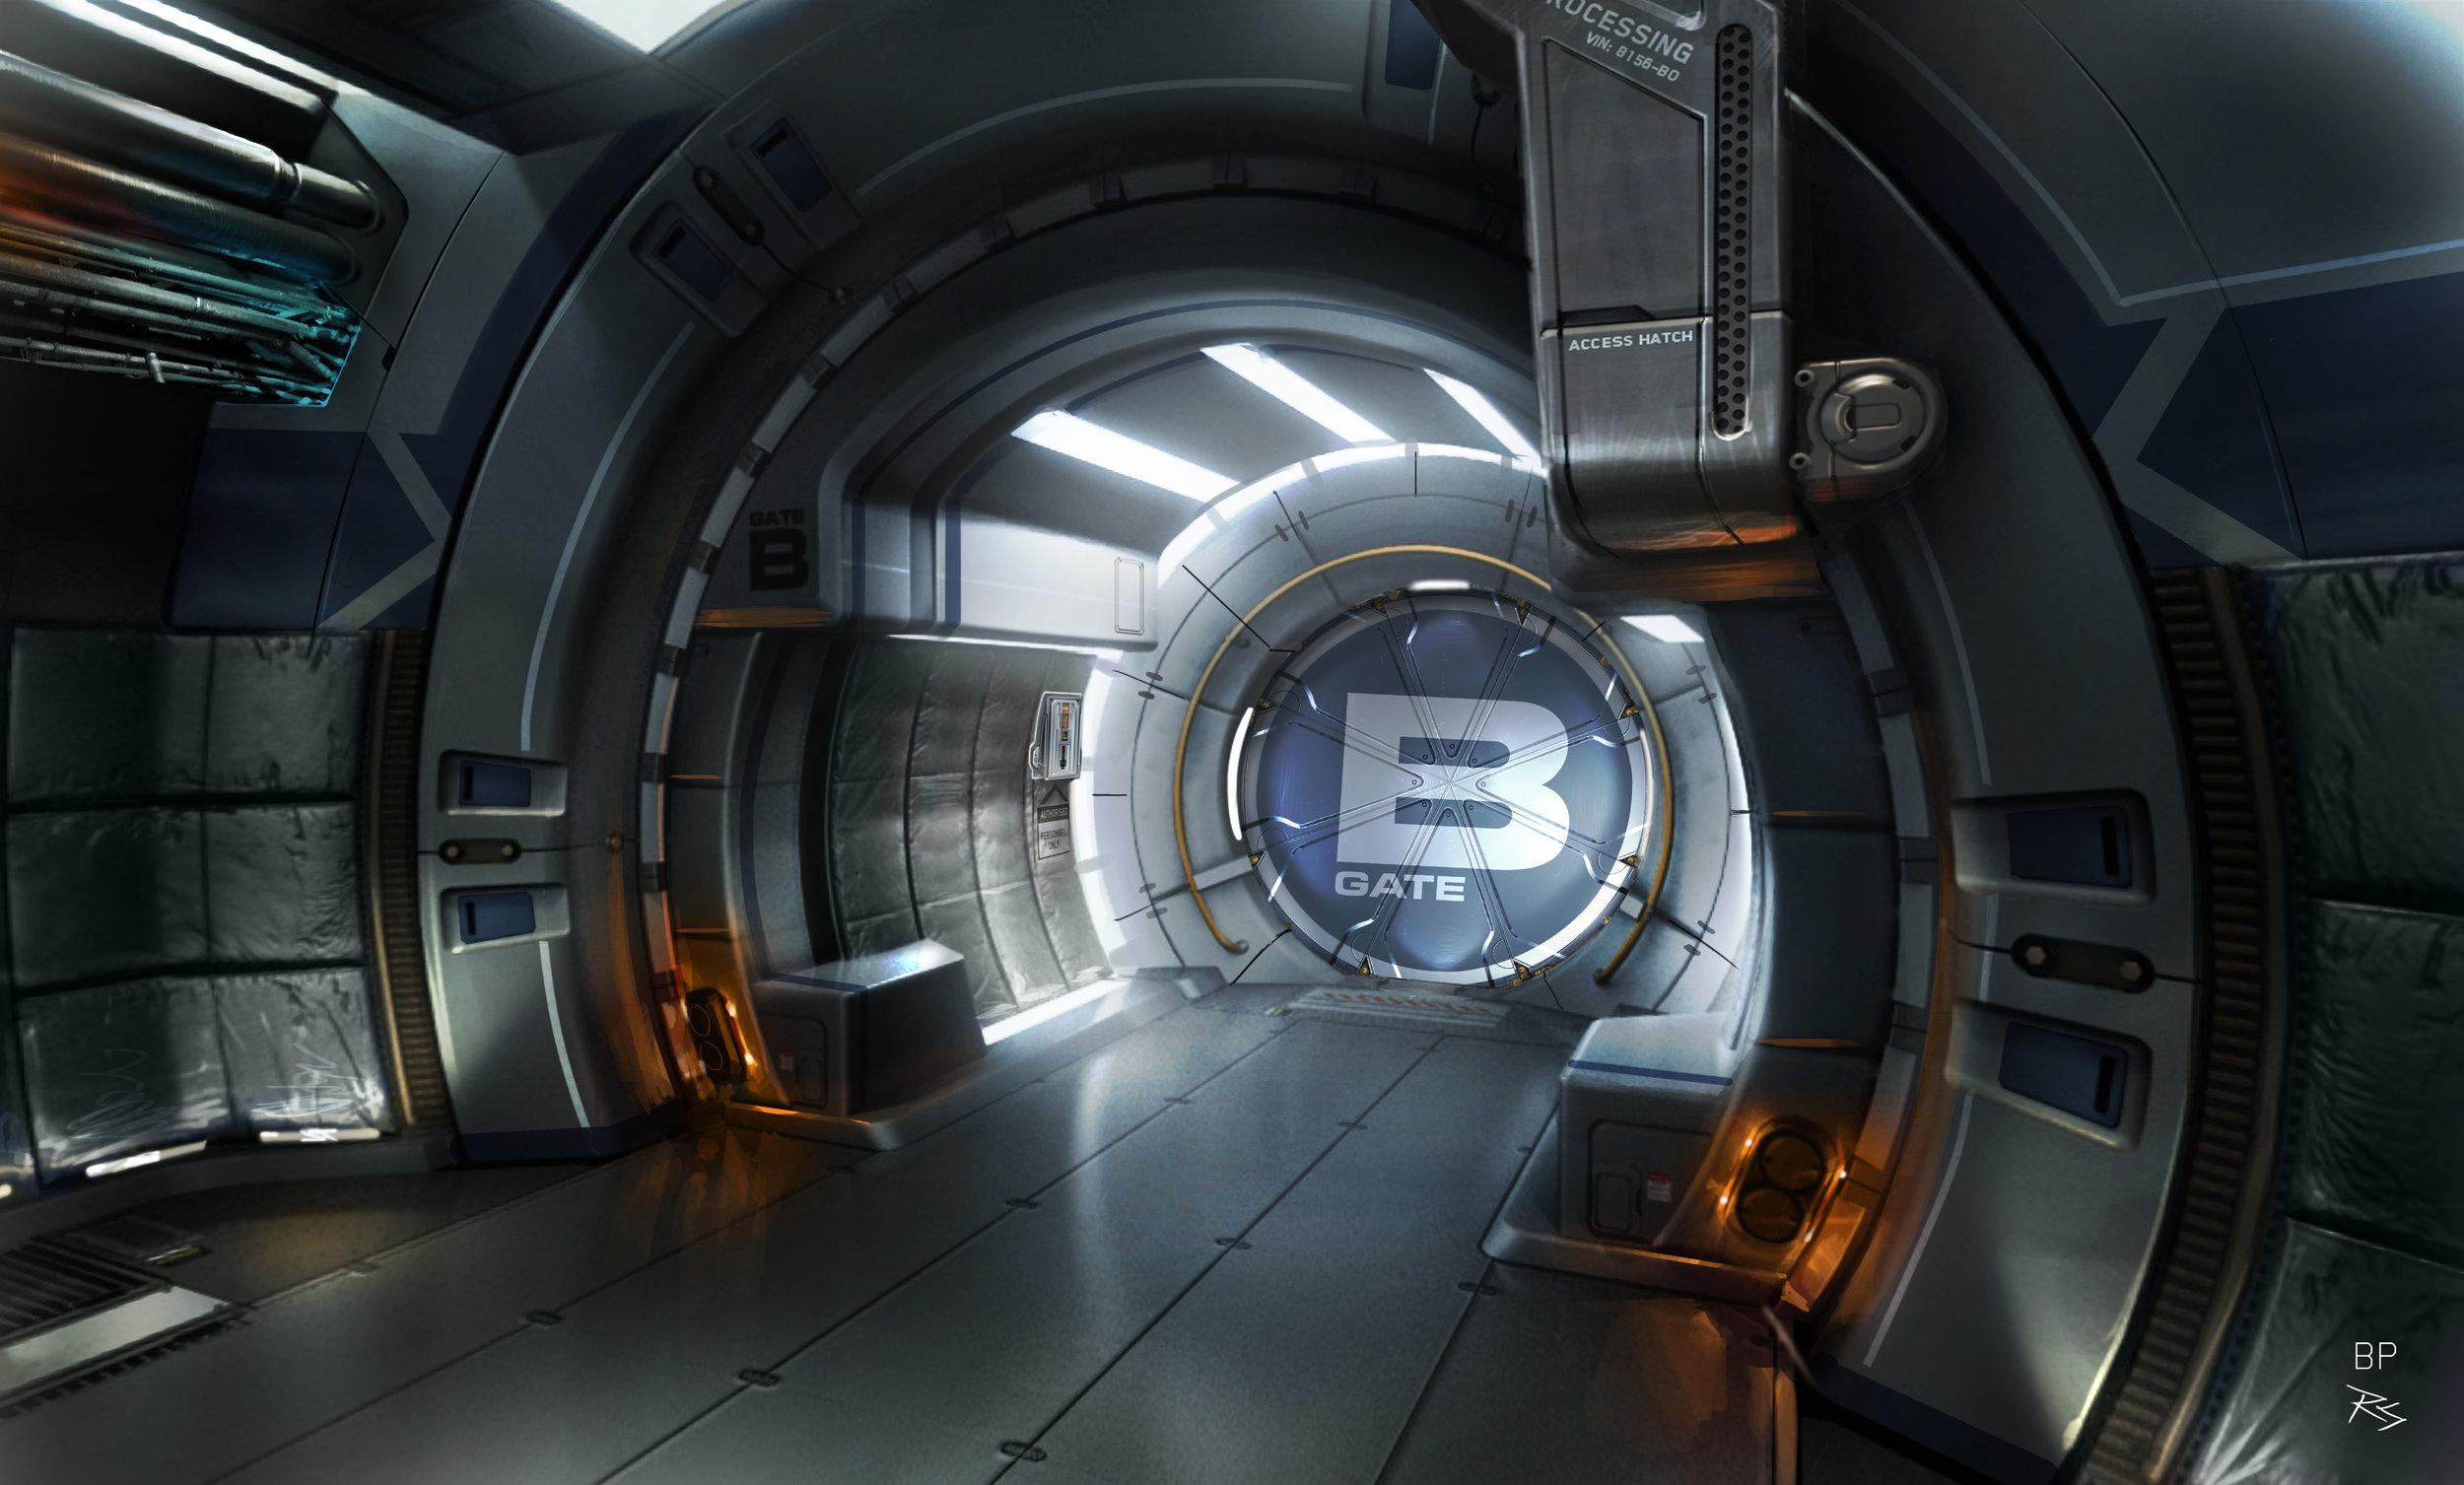 BS_BatRm_Ilo_120214_Hero_RS.jpg